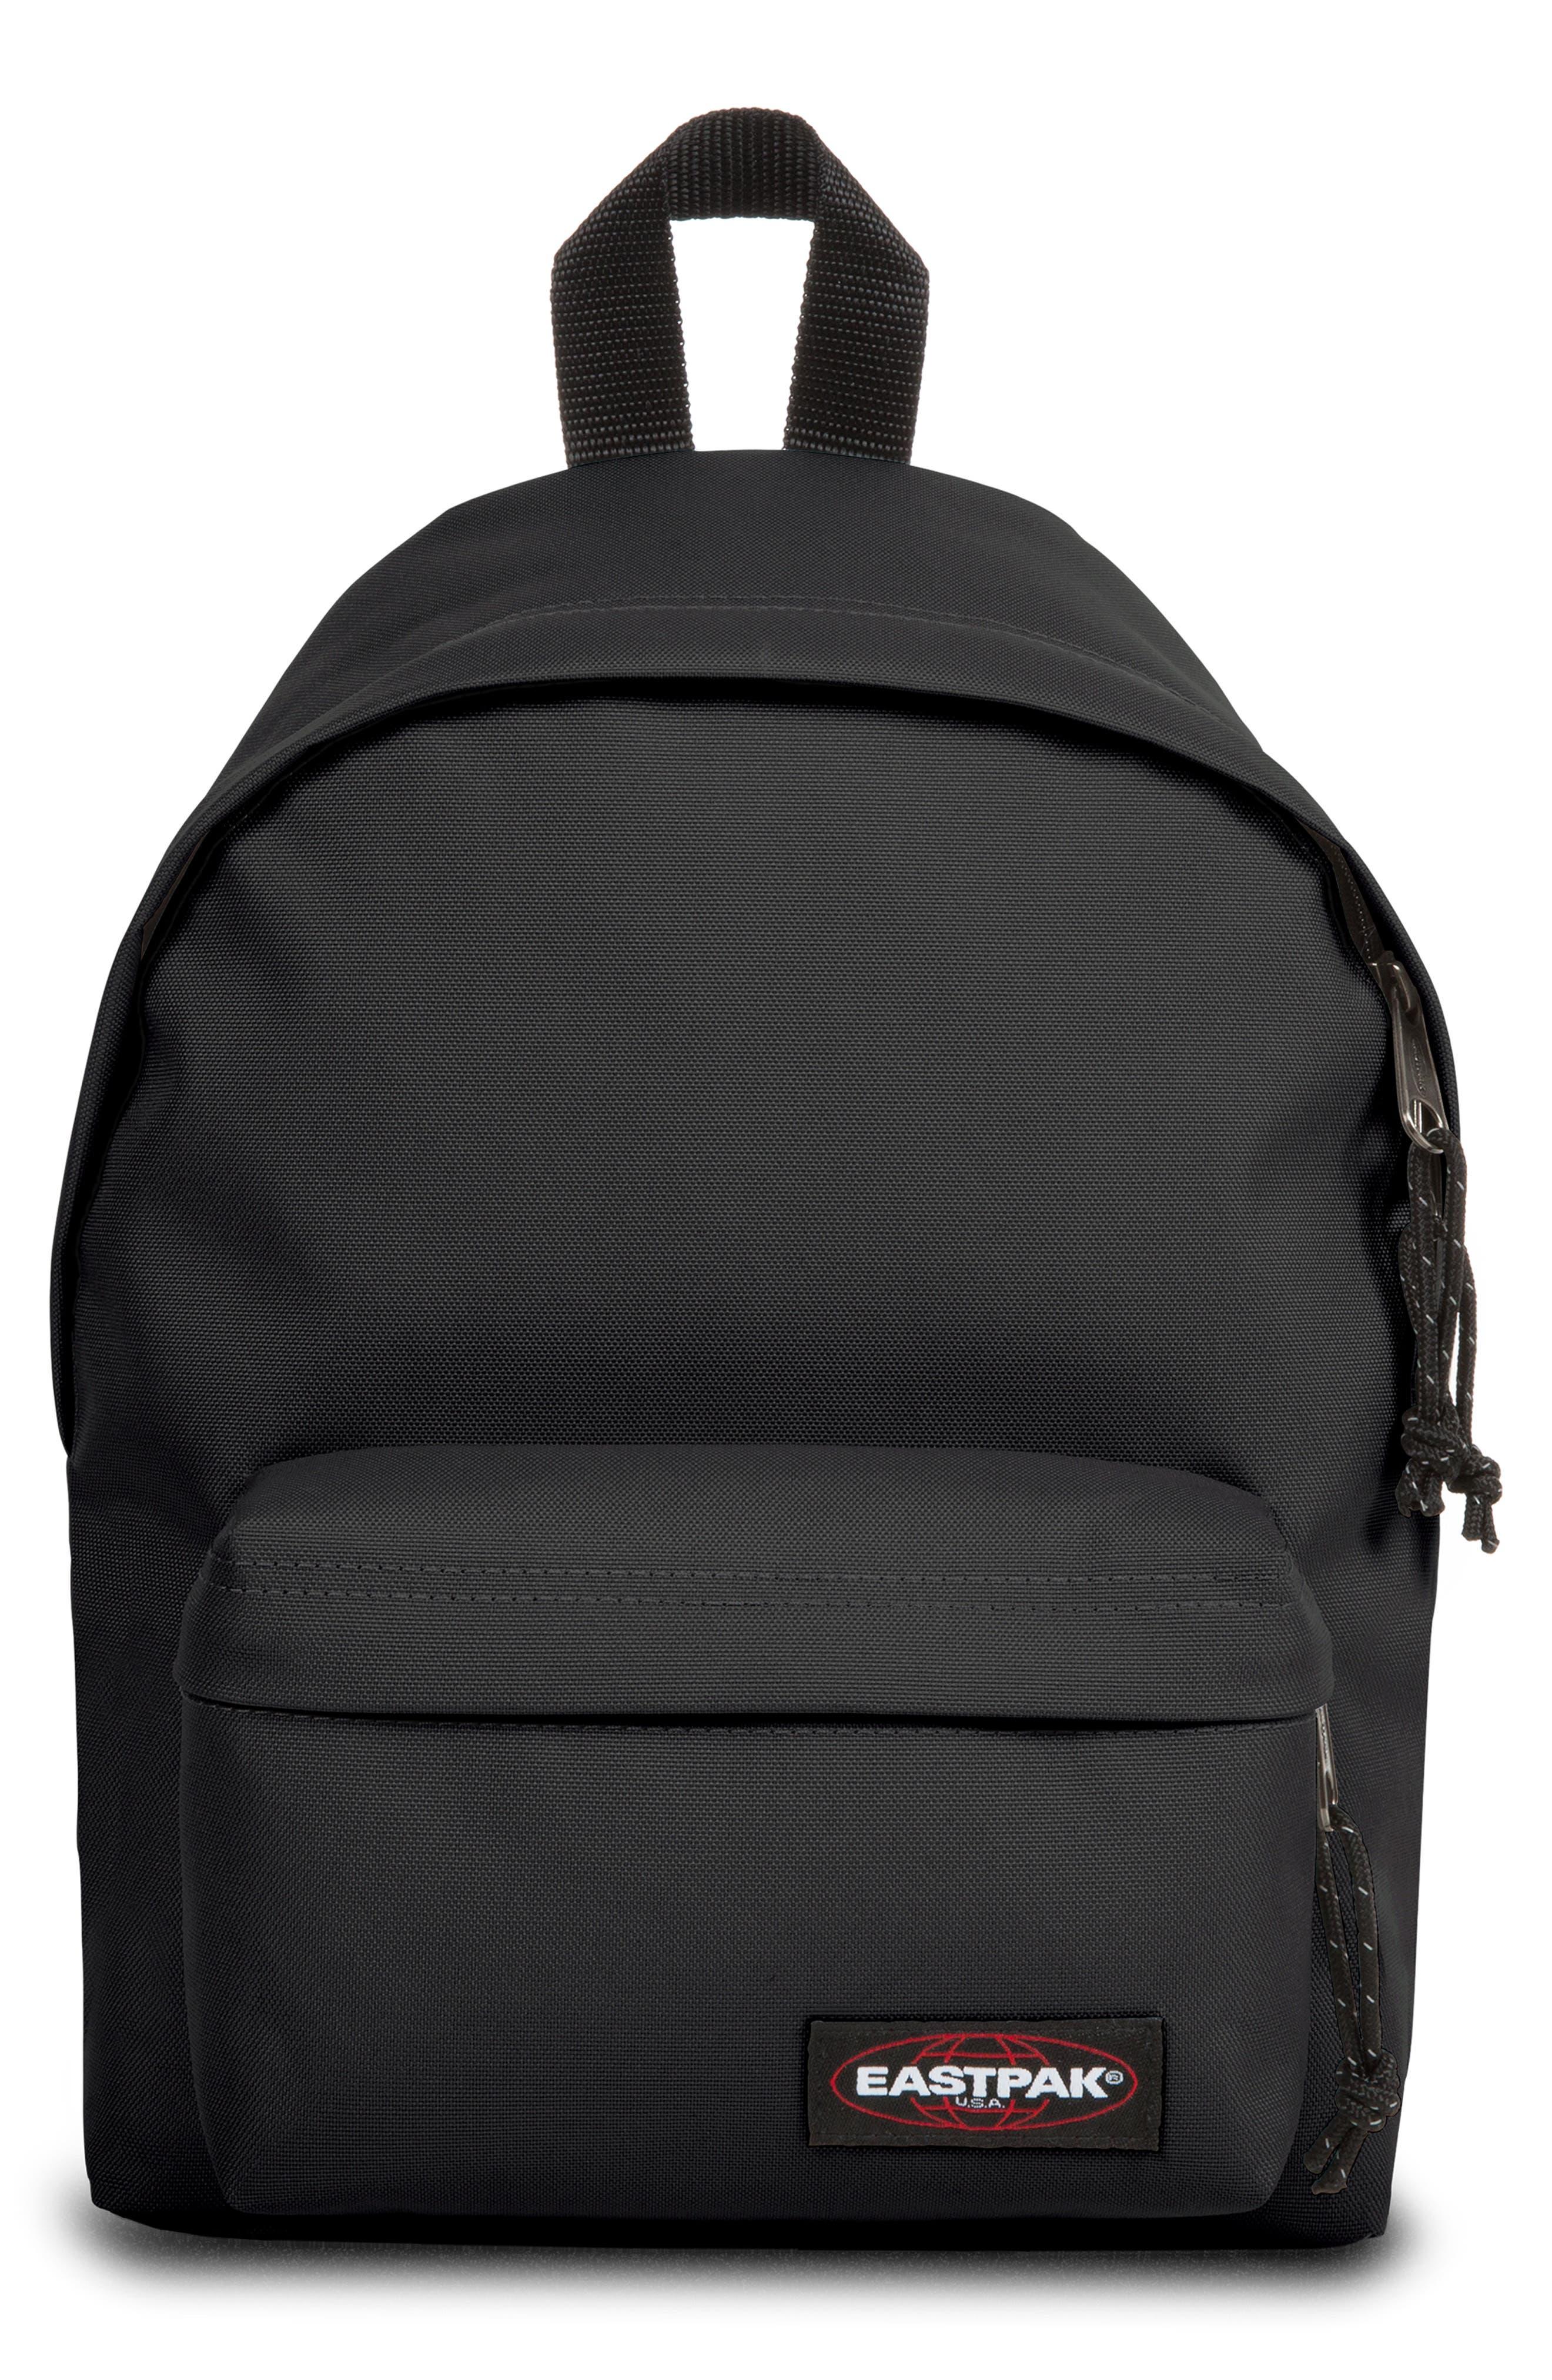 Eastpack Orbit Canvas Backpack -